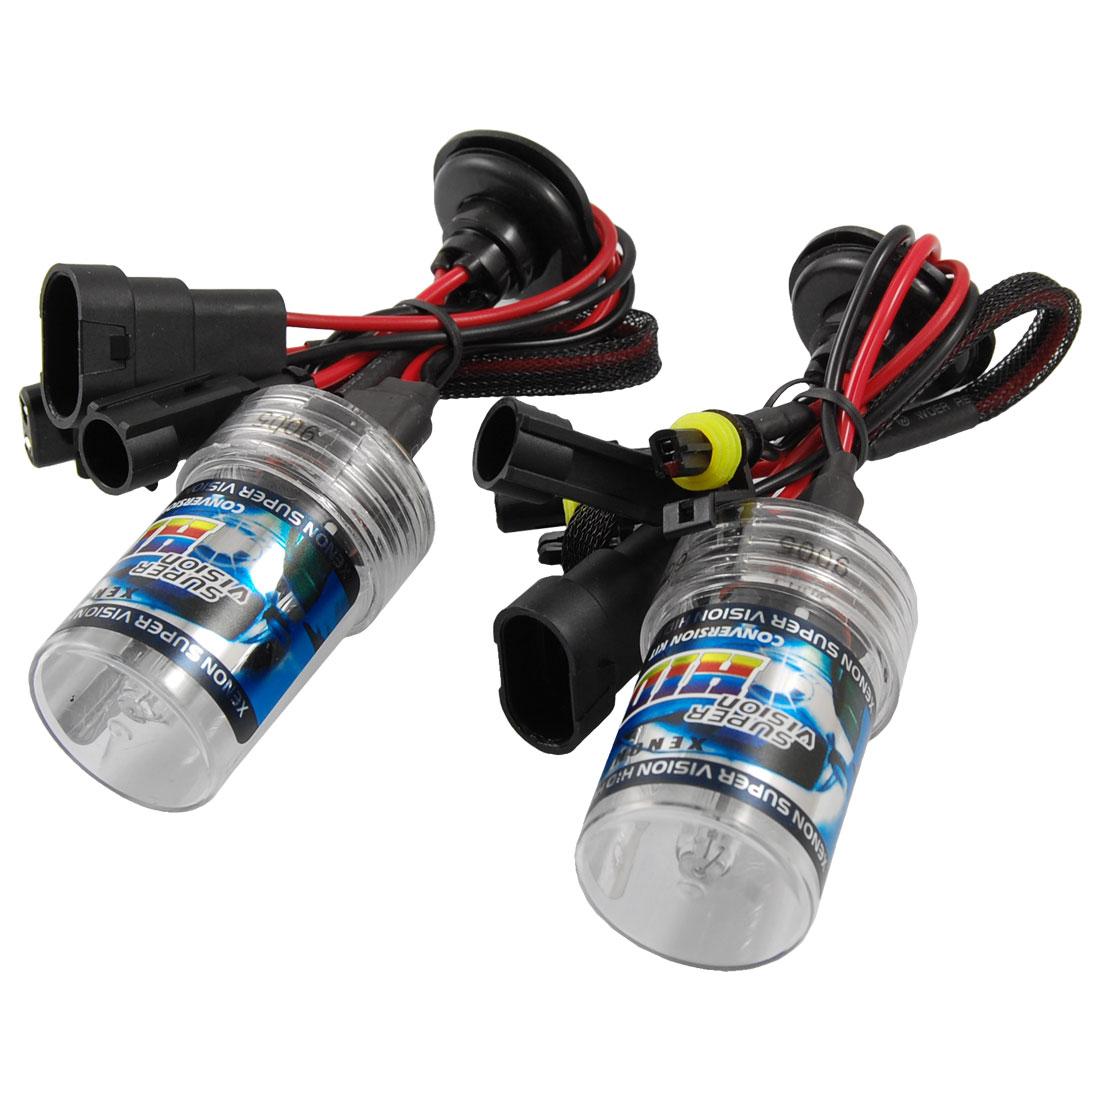 Car Head Lamp HID Xenon 9005 6000K 35W Headlight Slim Ballast Kit